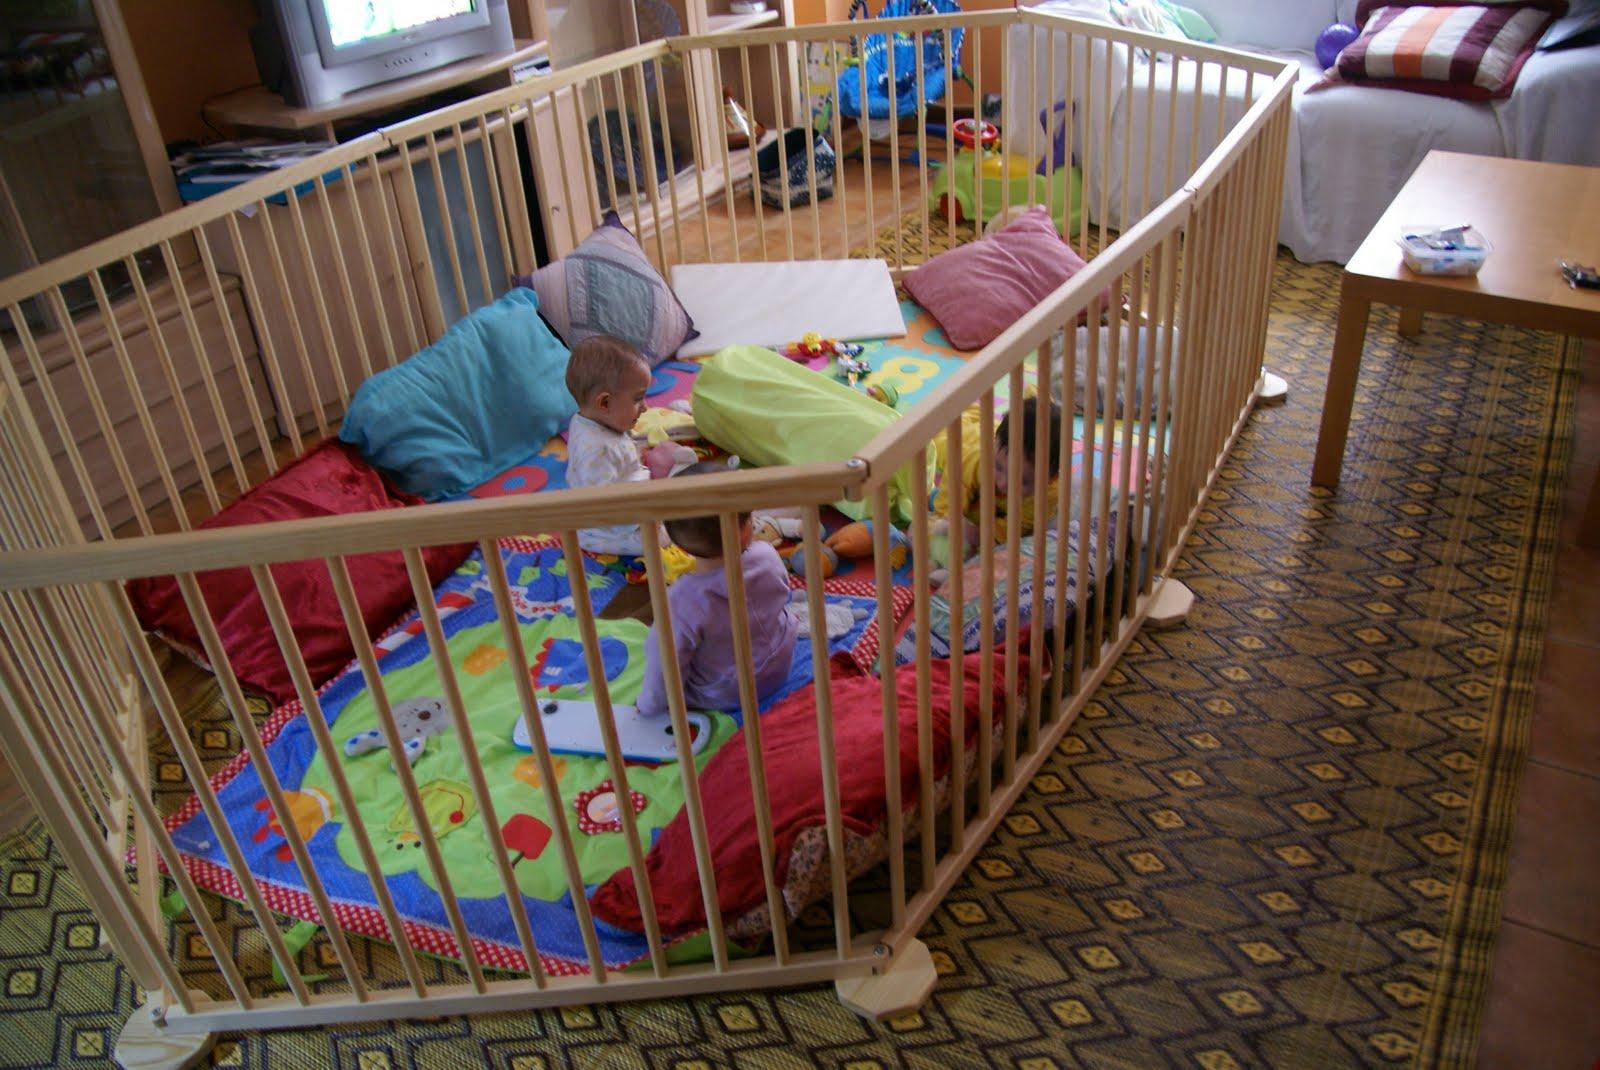 Trestrillistigres 2 julio 2011 - Construir parque infantil ...